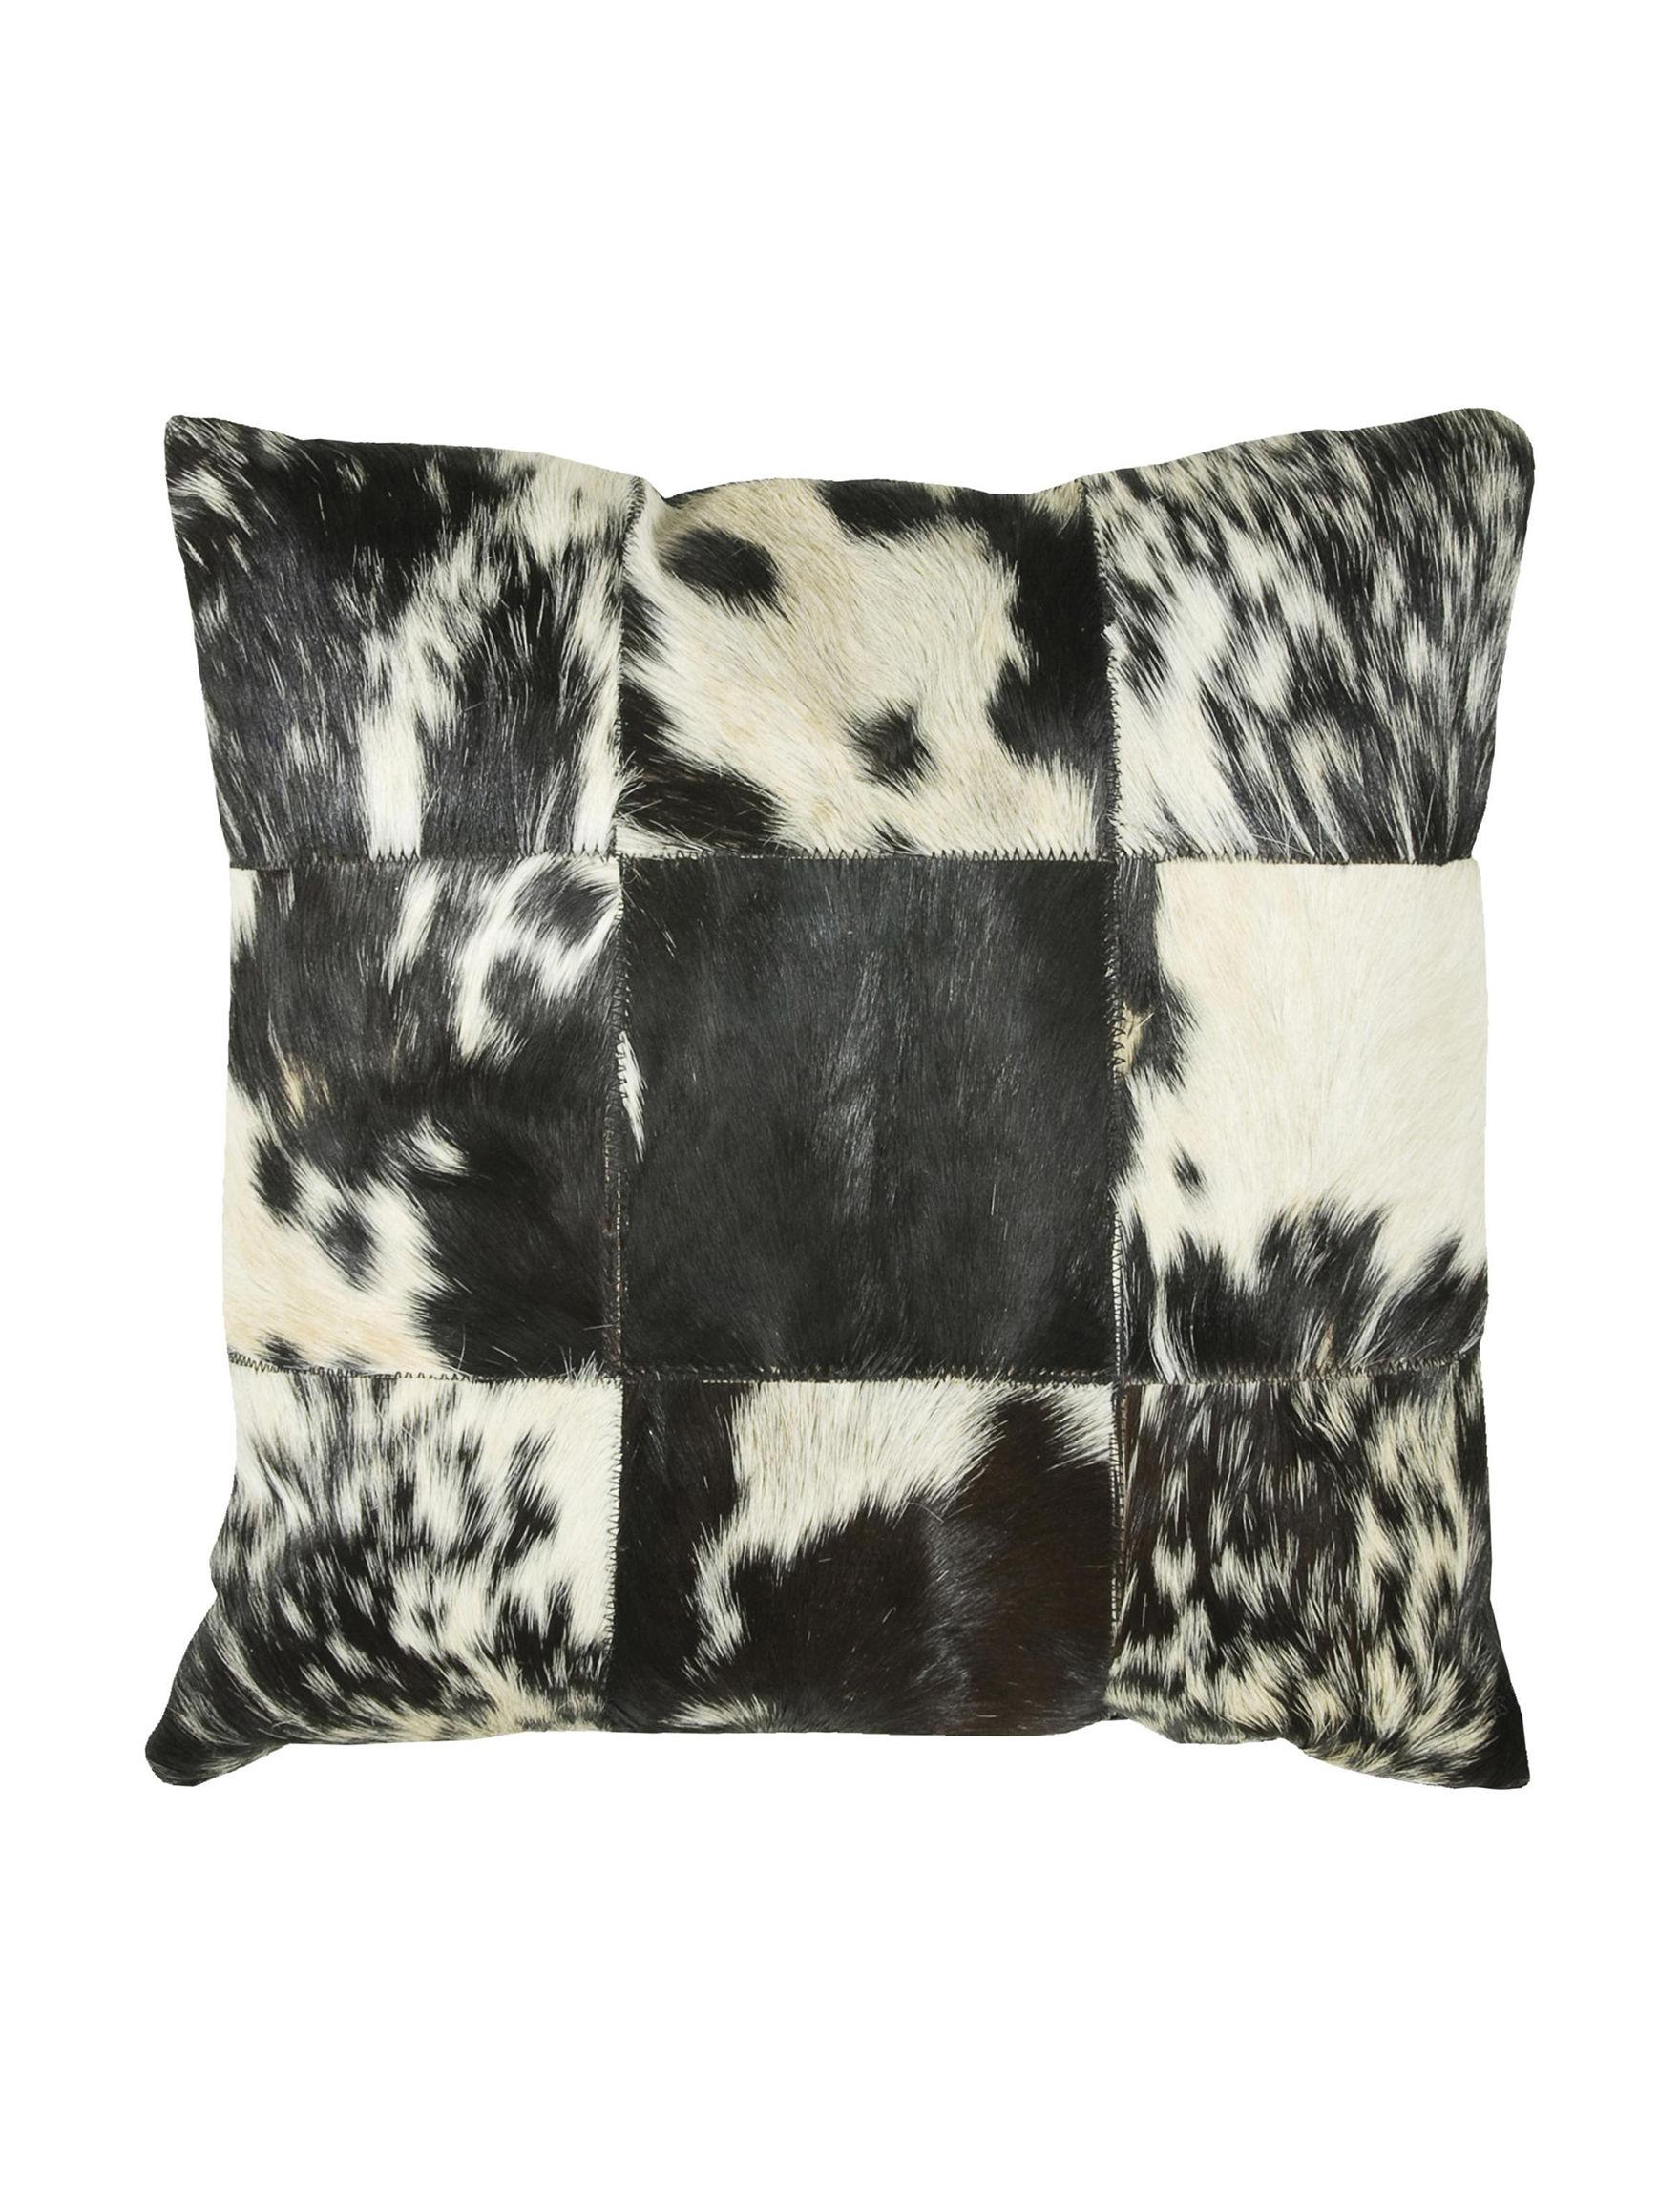 Rizzy Home Black /  White Decorative Pillows